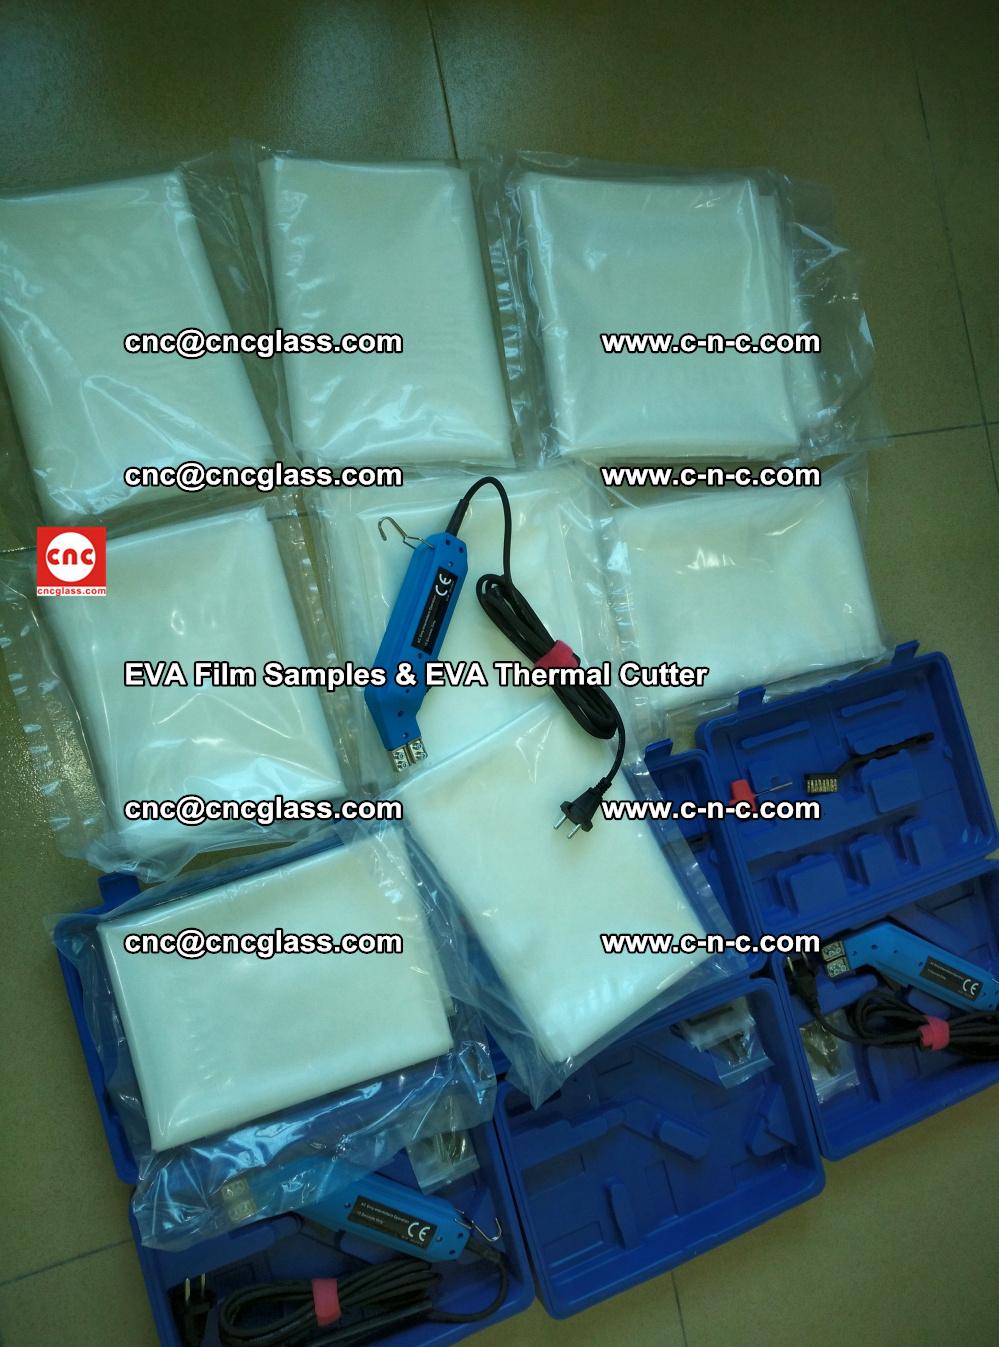 EVAFORCE SUPER CLEAR EVA Film Samples and EVA Thermal Cutter (5)